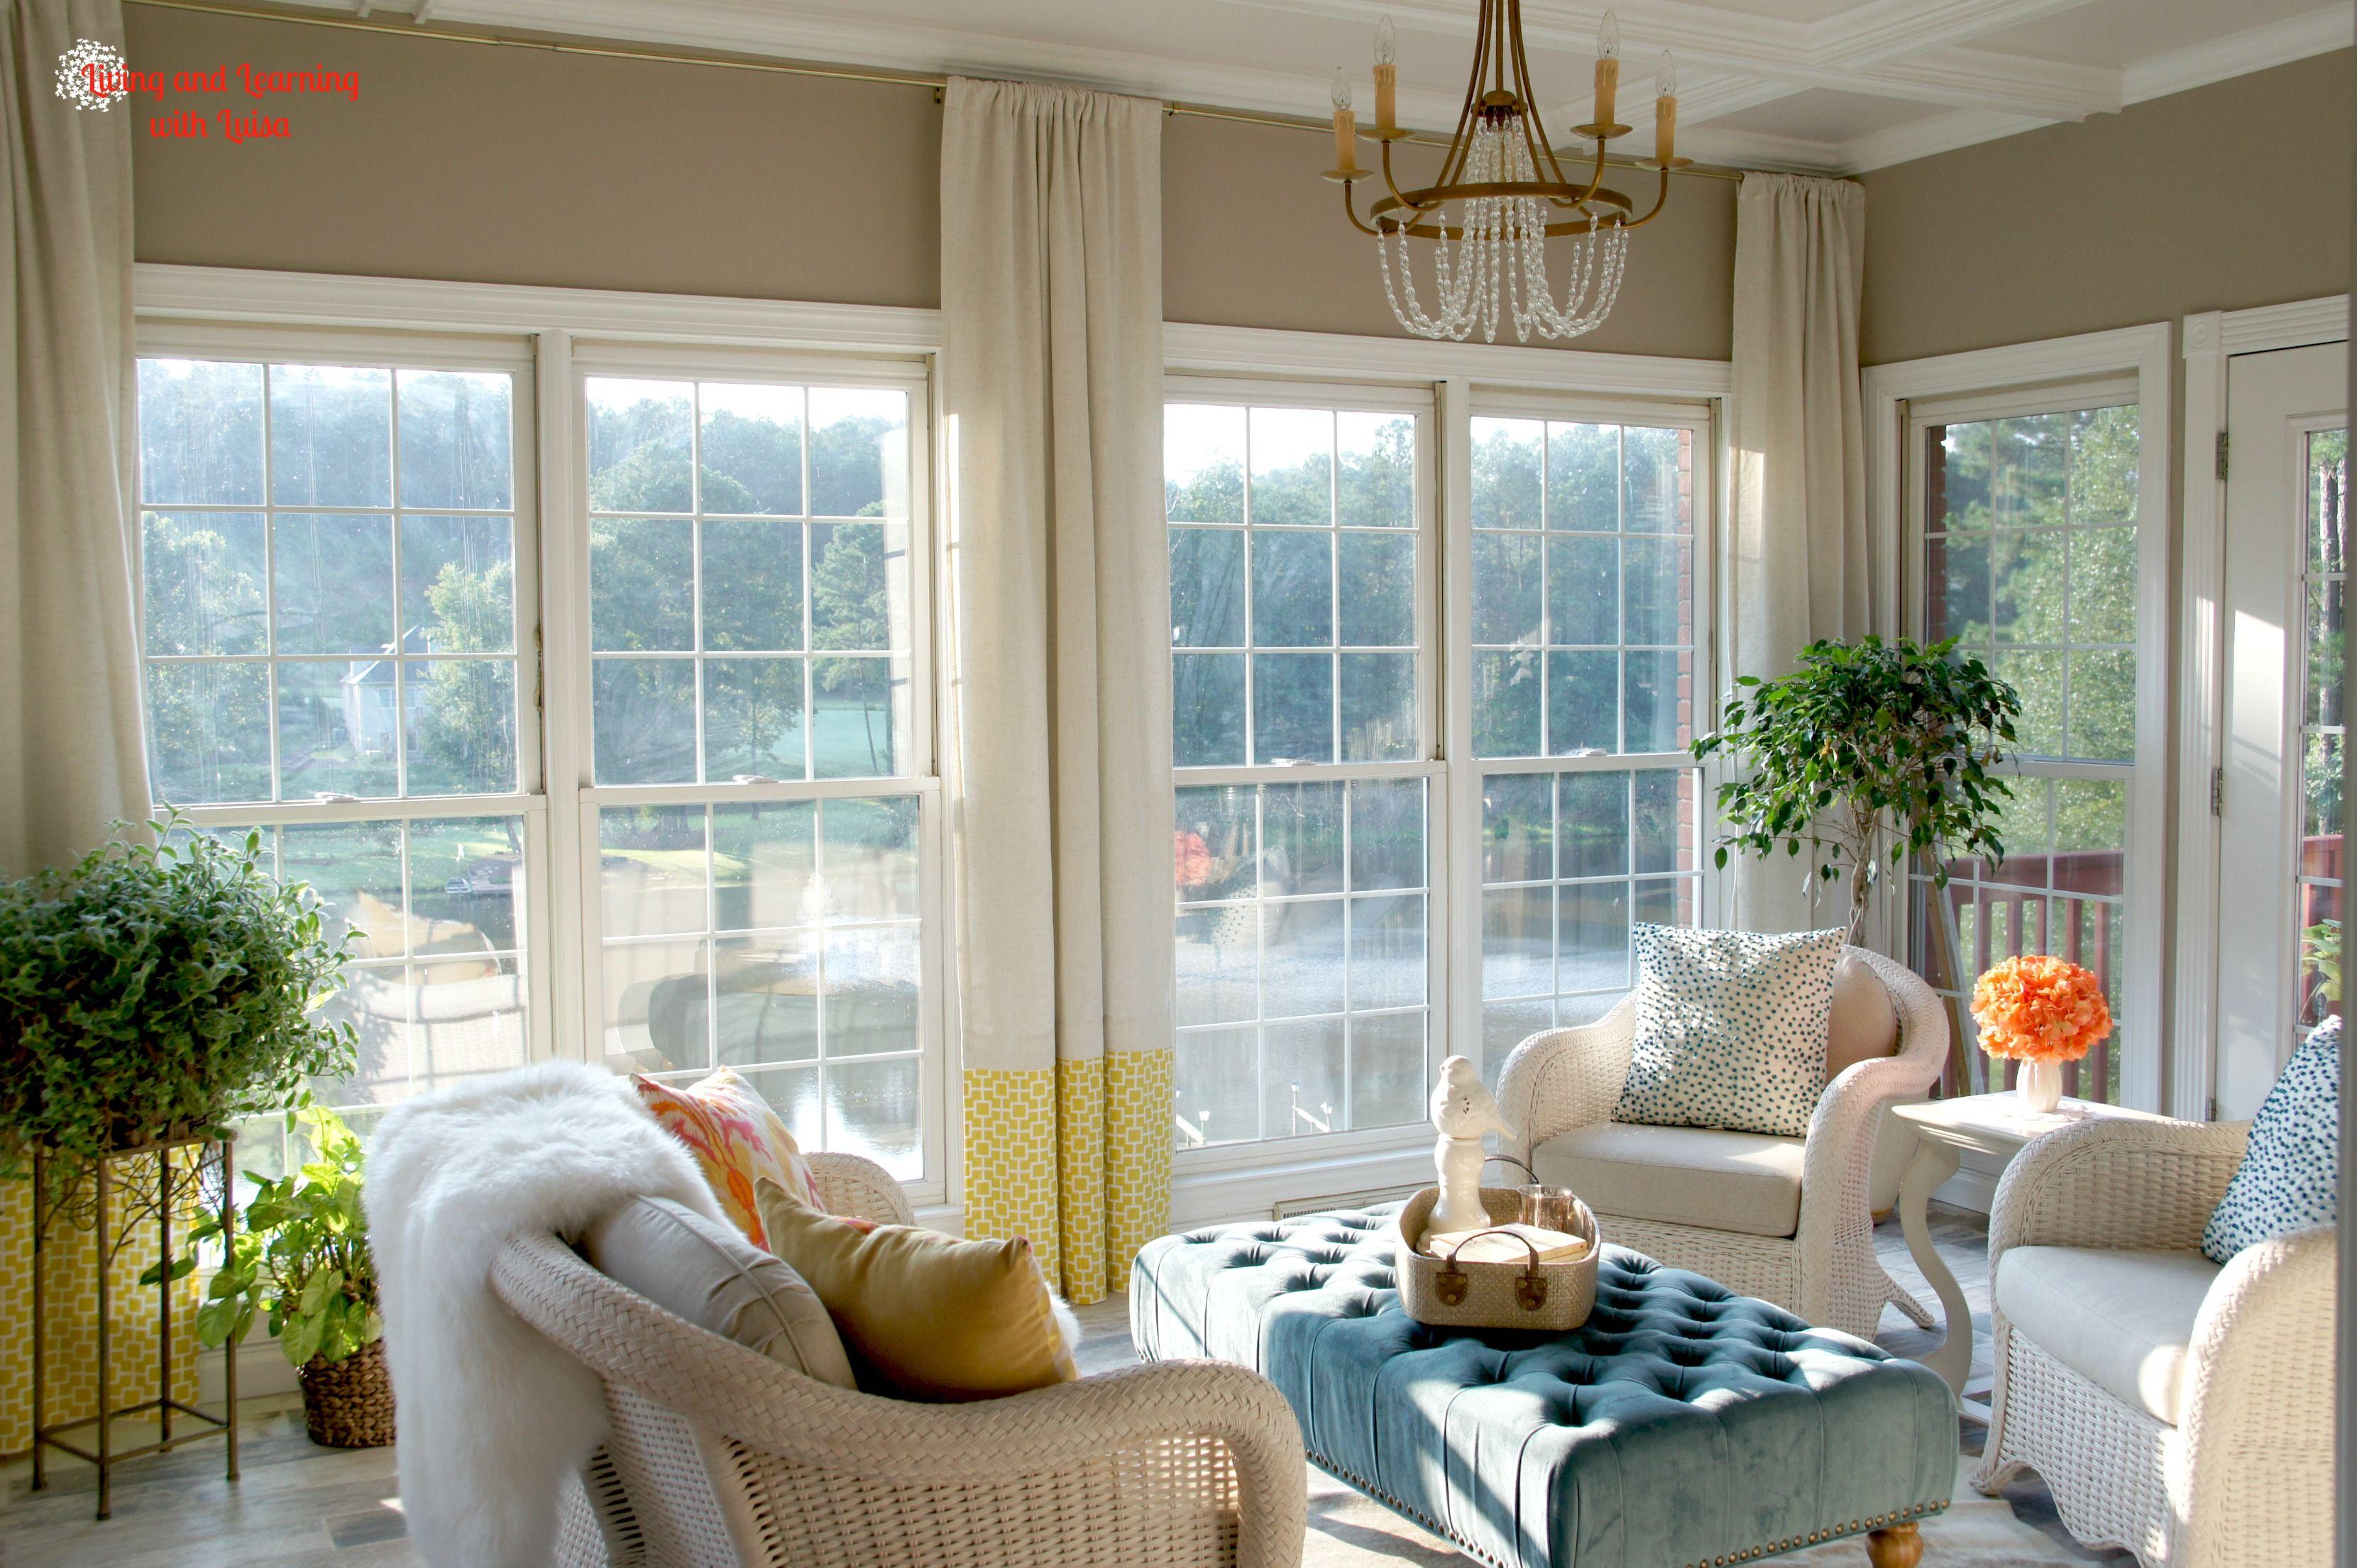 Explore Sunroom Curtains, Sunroom Ideas, and more!